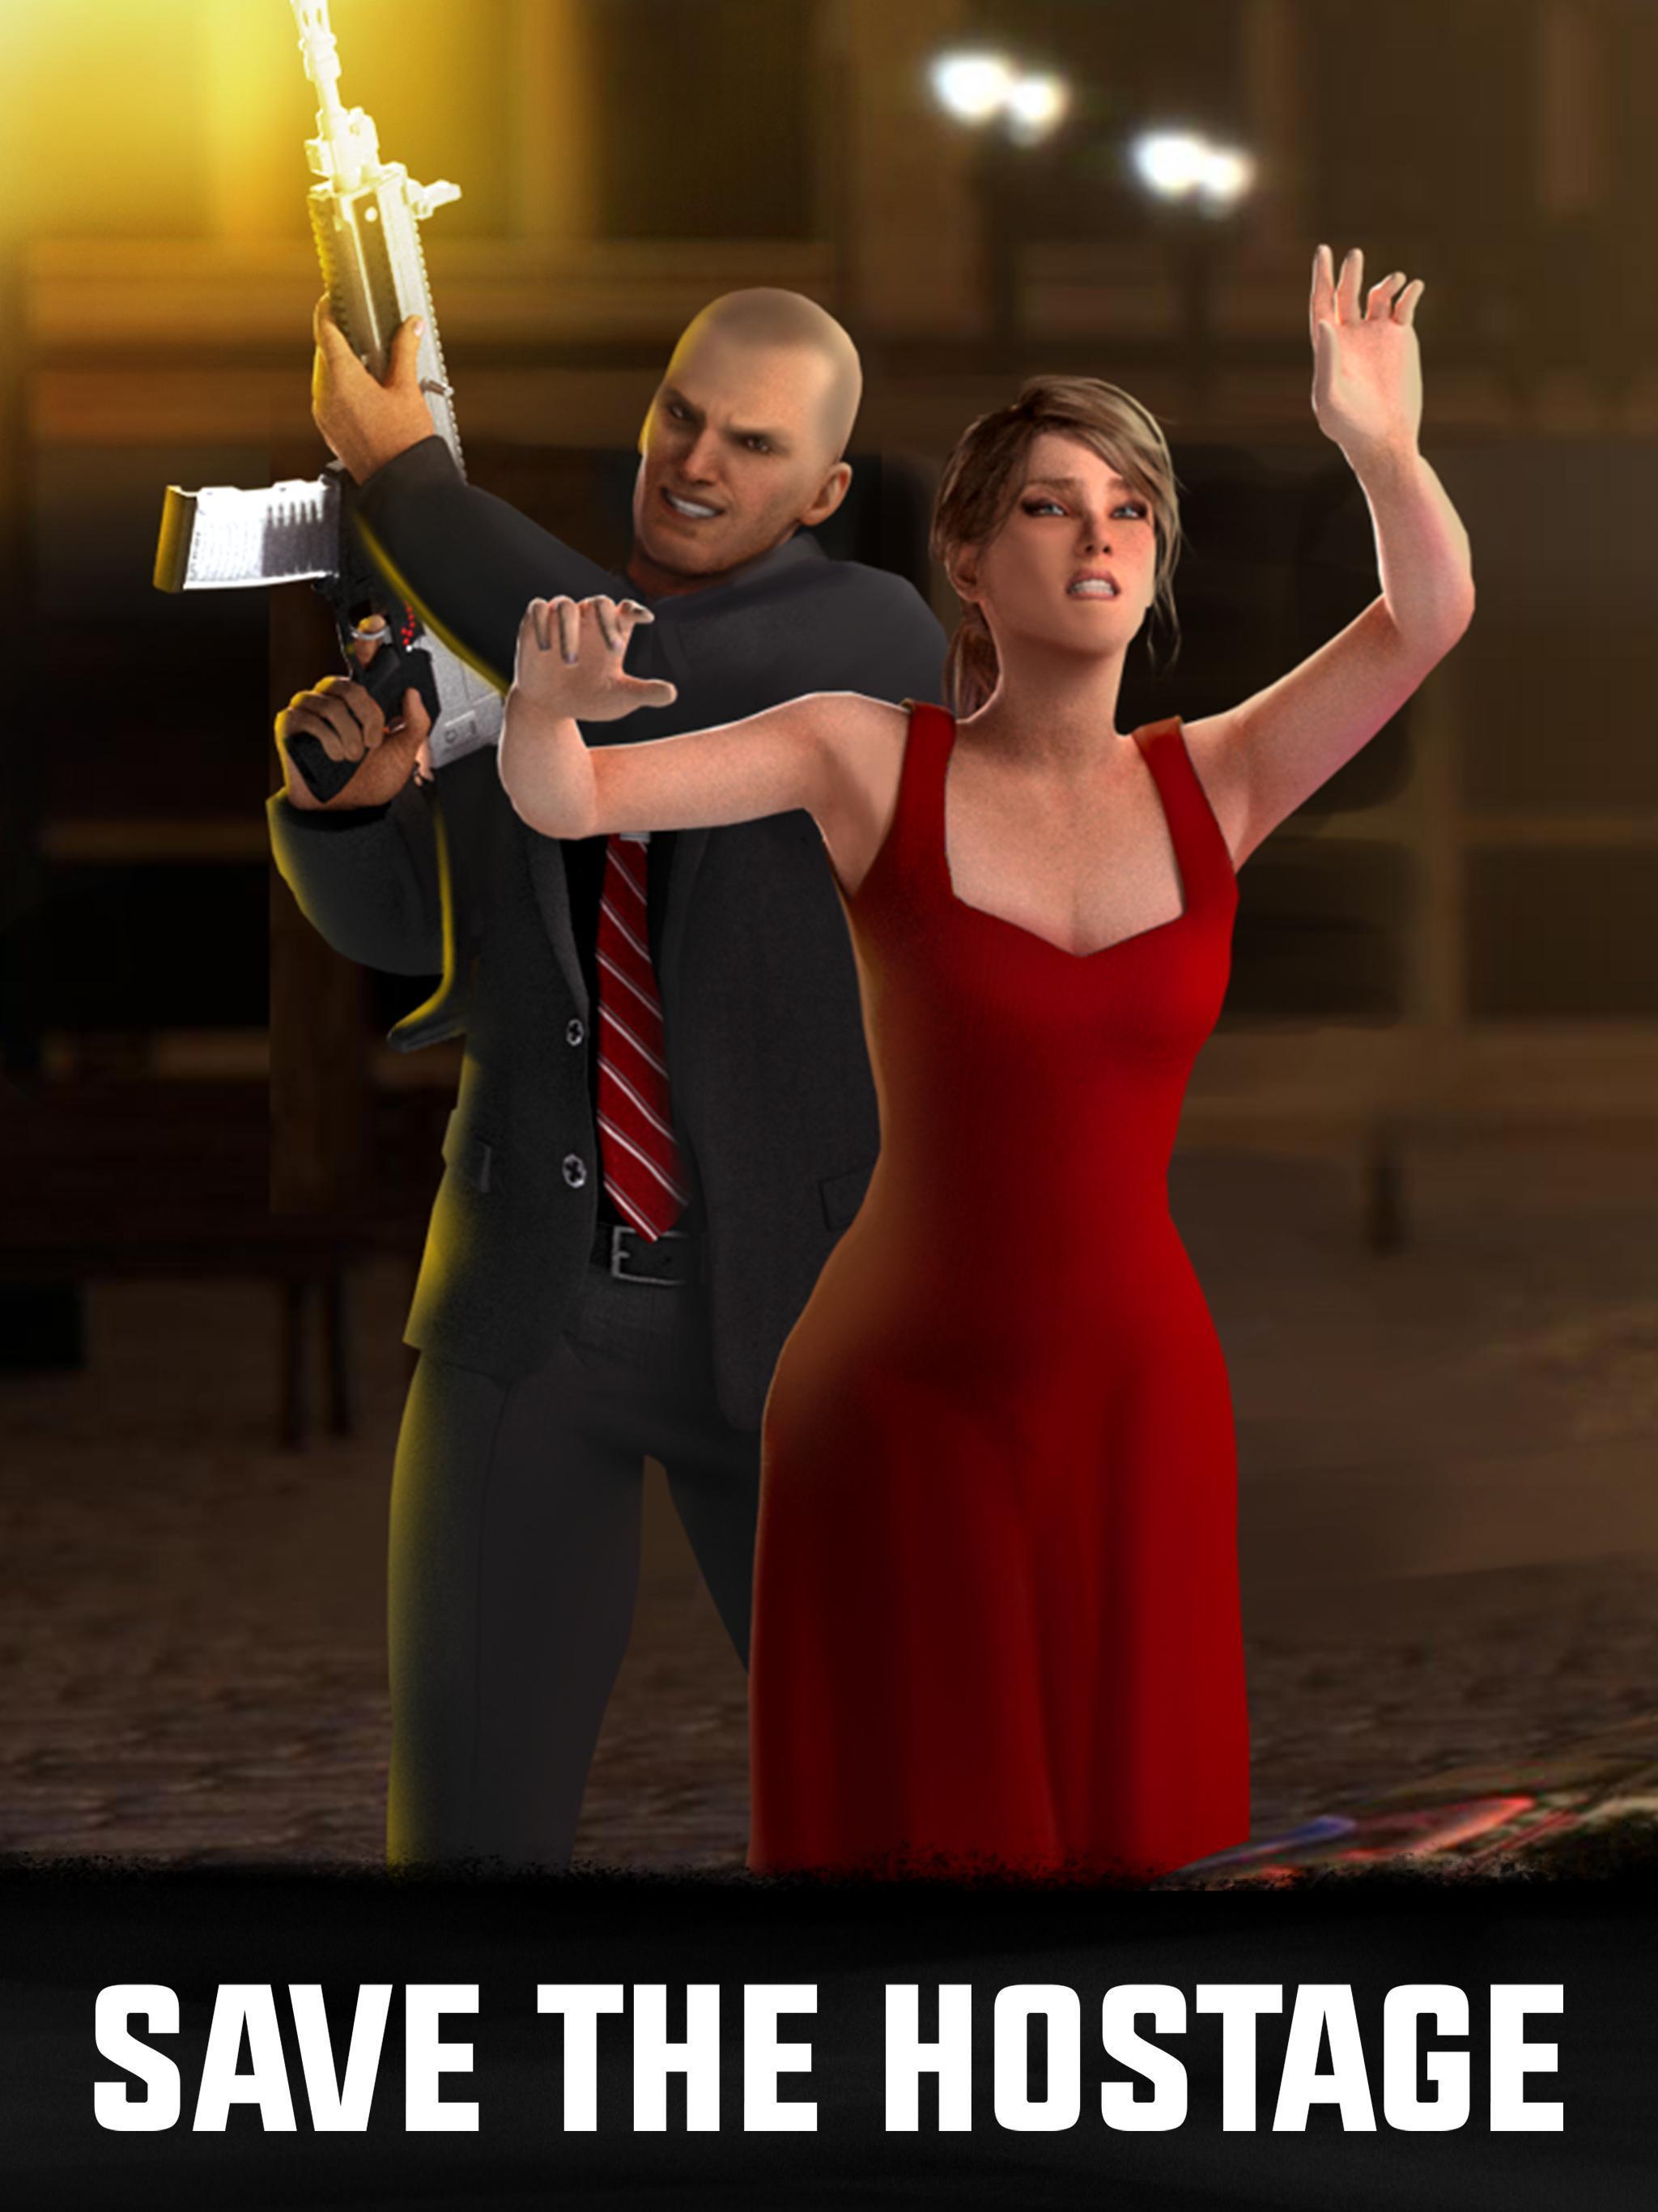 Sniper 3D Fun Free Online FPS Shooting Game 3.15.1 Screenshot 1